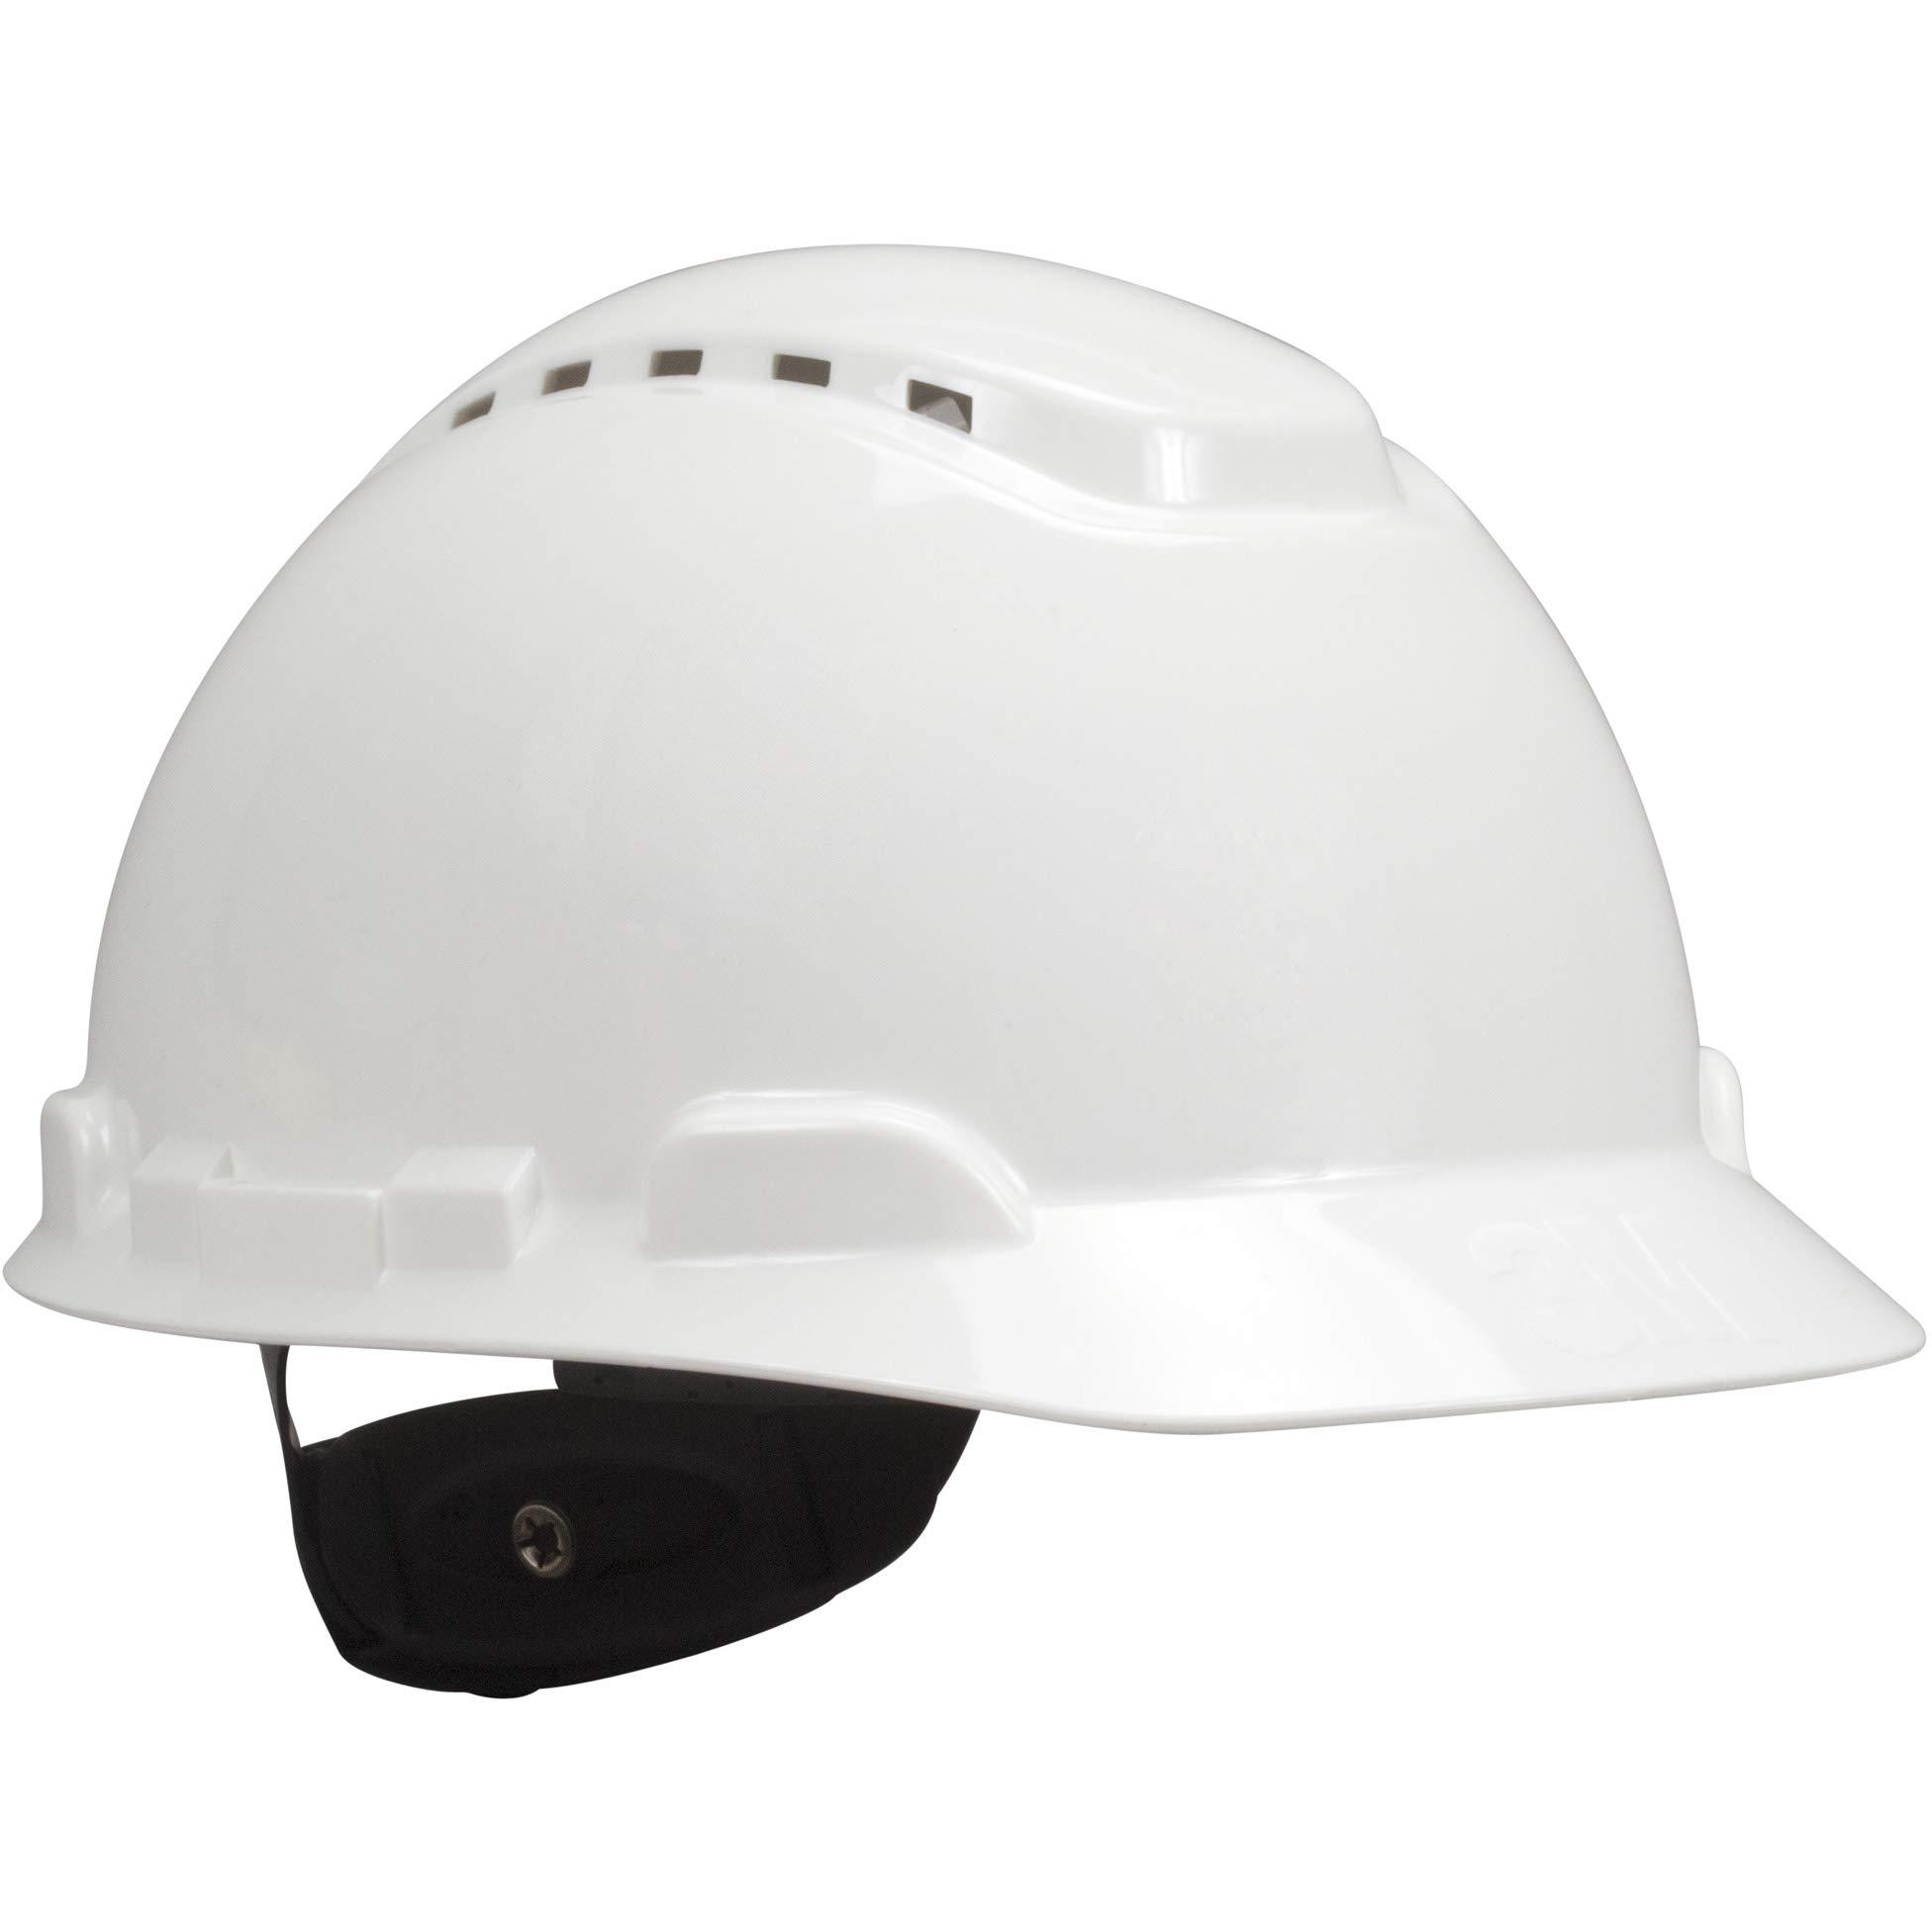 3M Hard Hat, White, Lightweight, Vented, UV Indicator, Adjustable 4-Point Ratchet, H-701V-UV